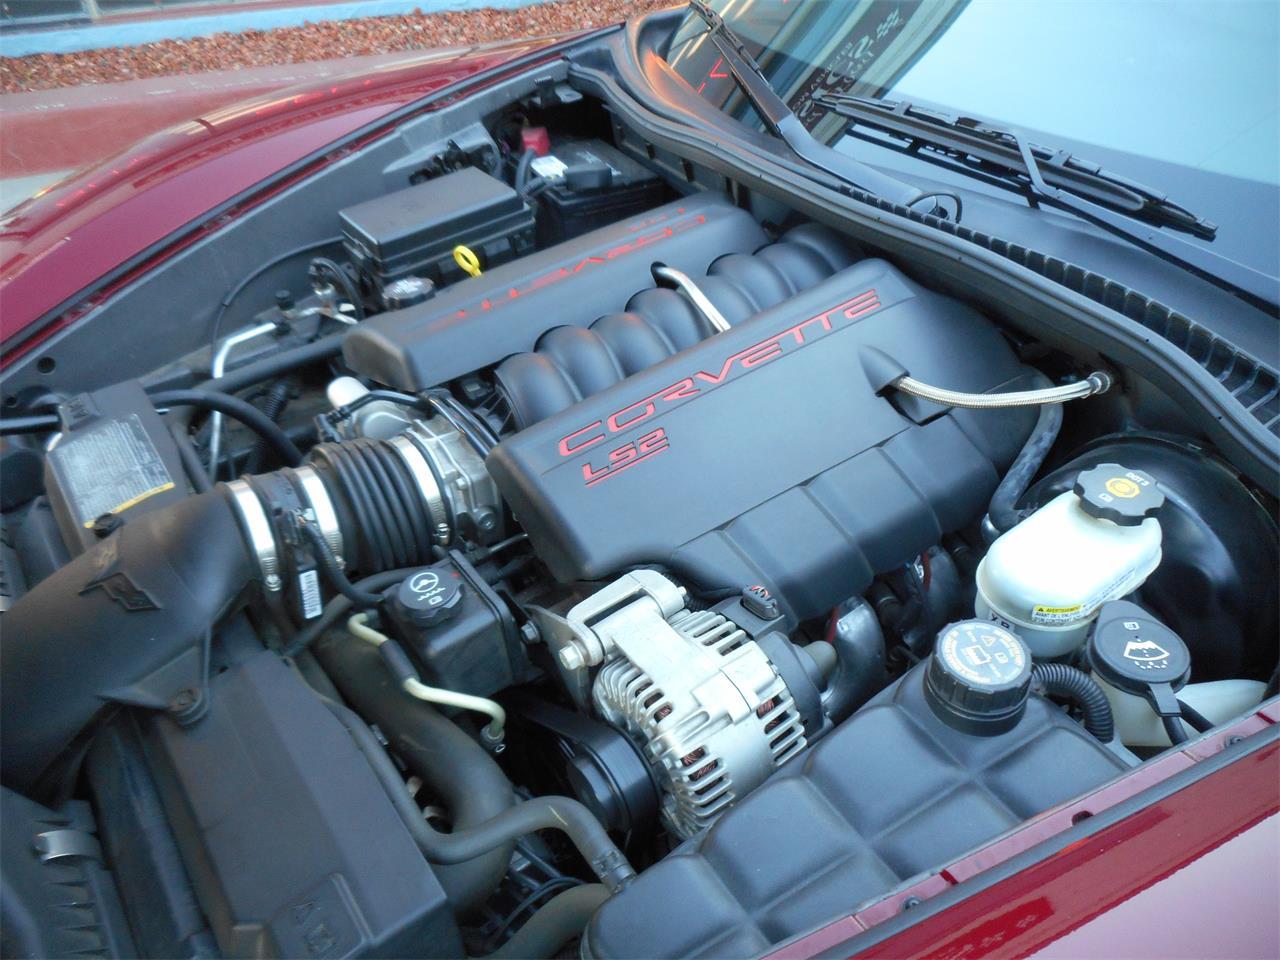 Large Picture of '05 Chevrolet Corvette located in California - $19,900.00 - MF1Z